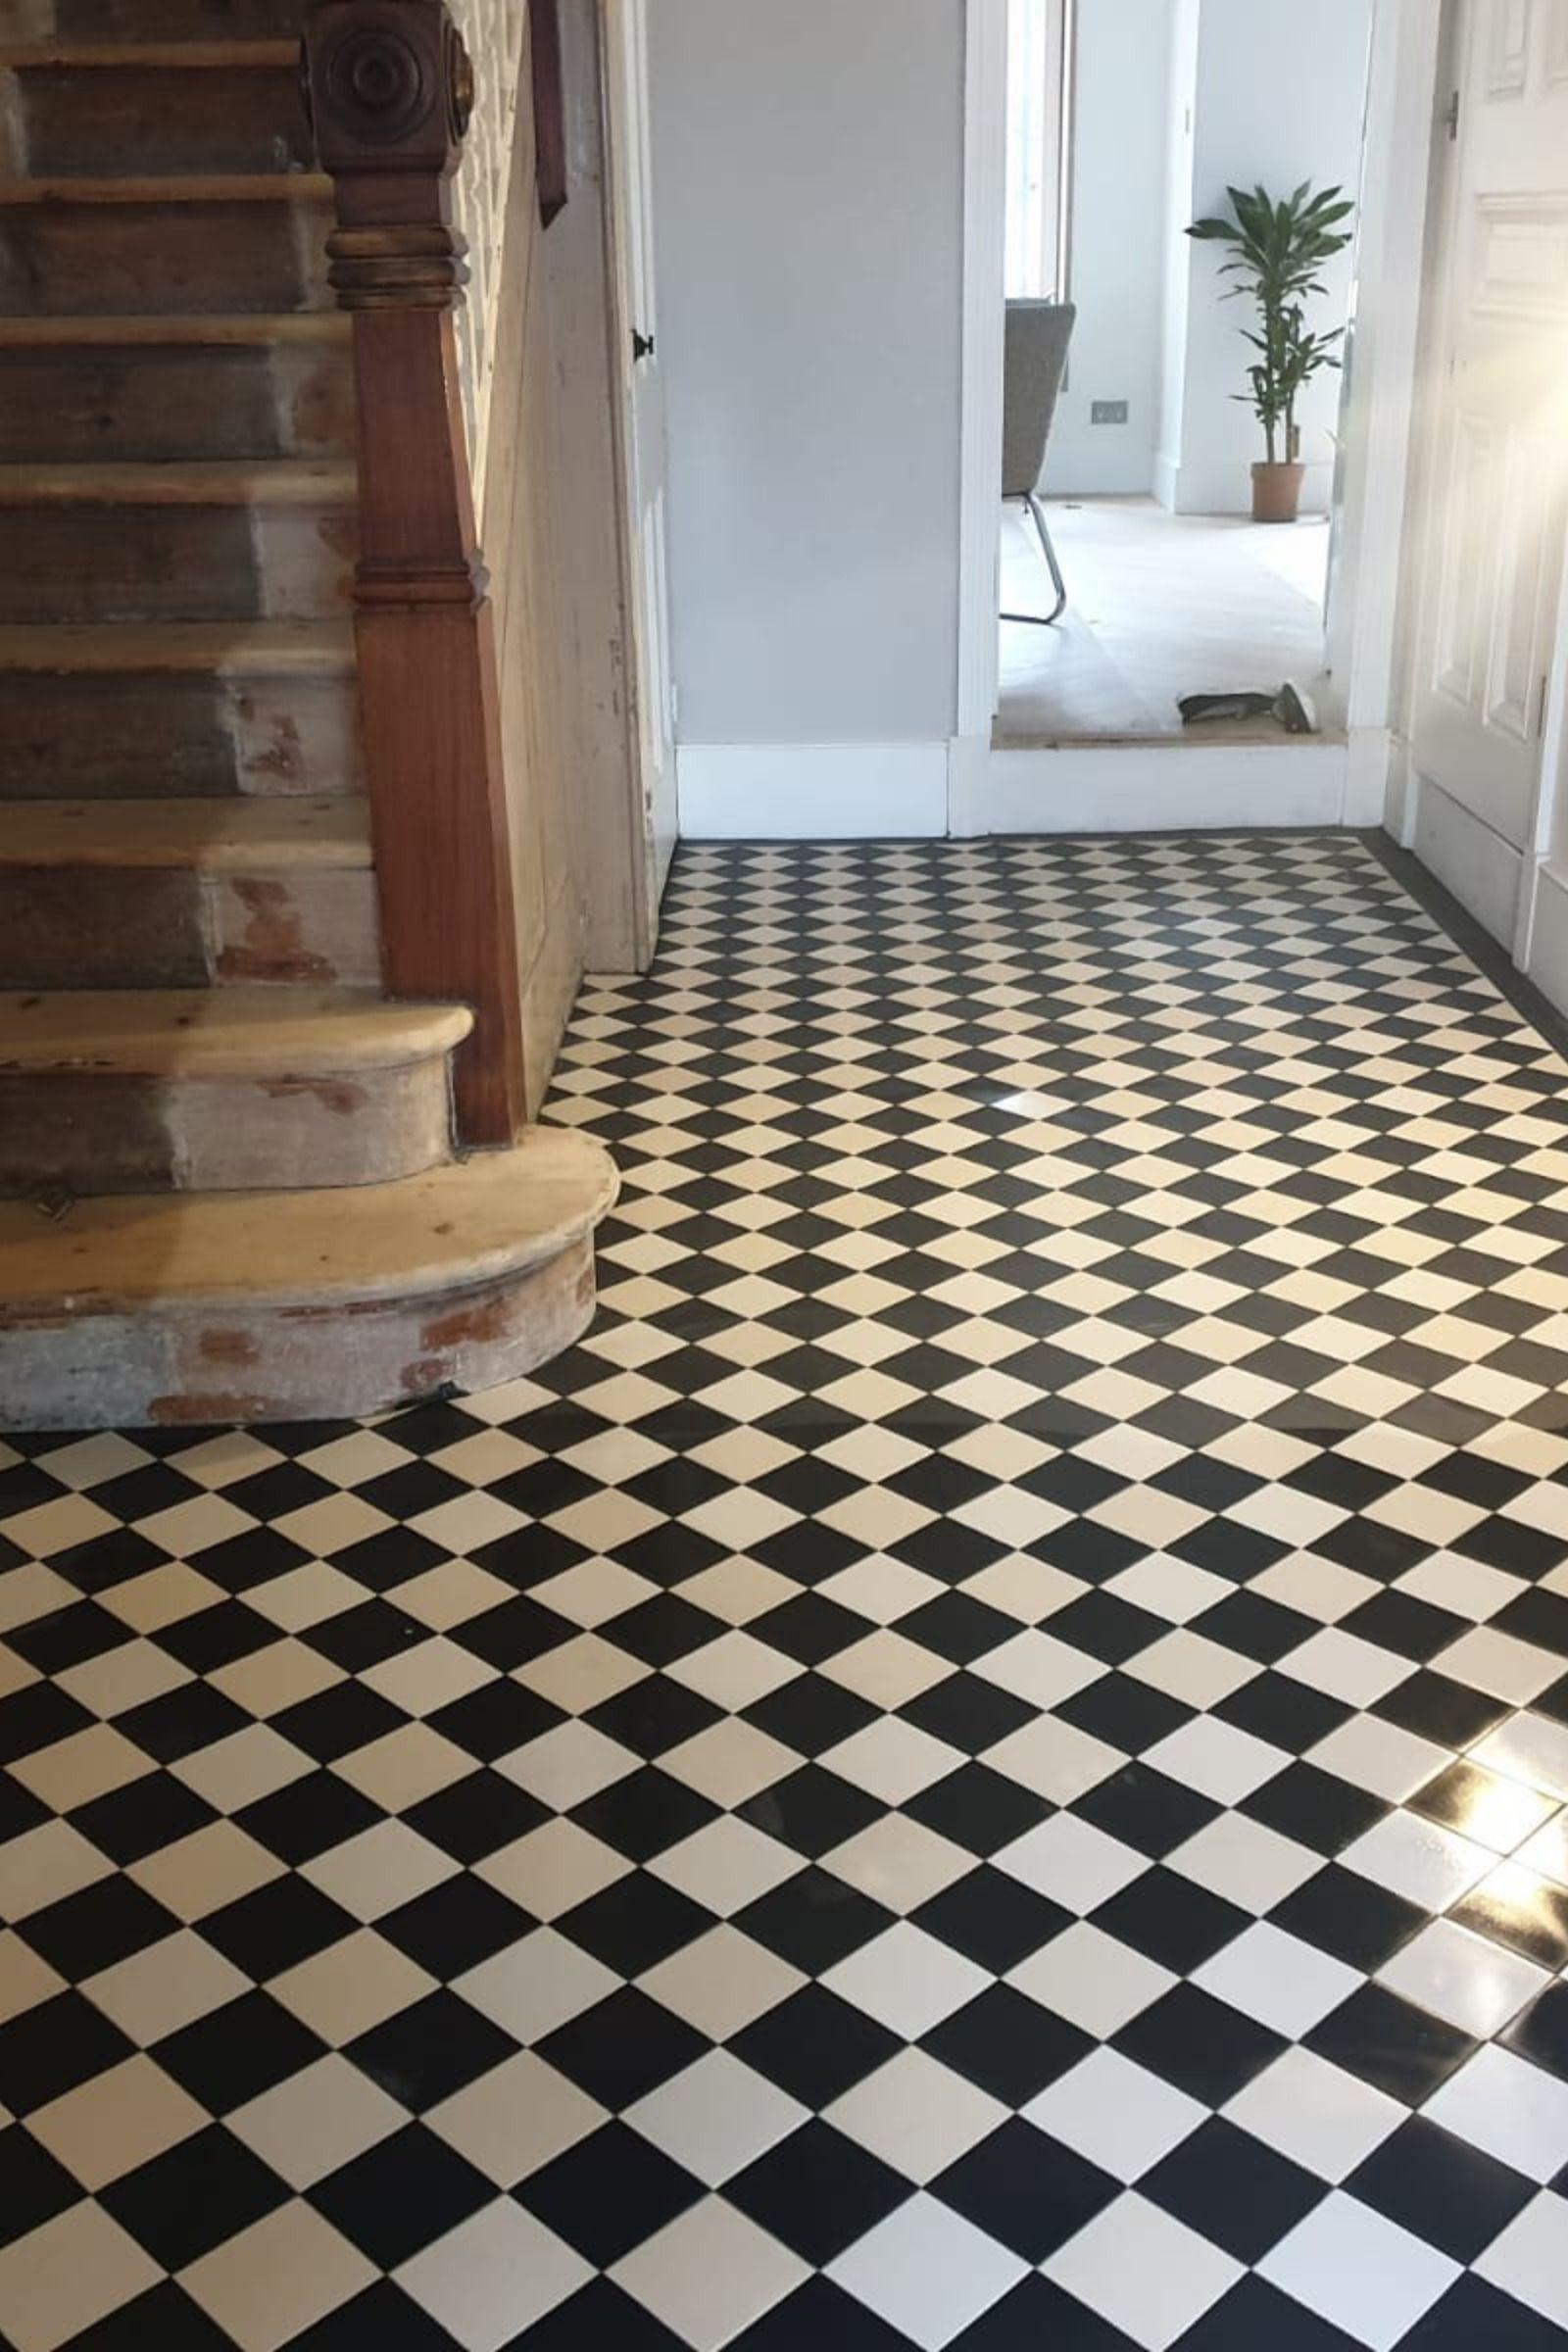 London Mosaic Chequerboard Hallway Floor Tiles Www Londonmosaic Com Contac Chequerboard Contac Floor Hallway London Mosaic Tiles Wwwlondonmosa 2020